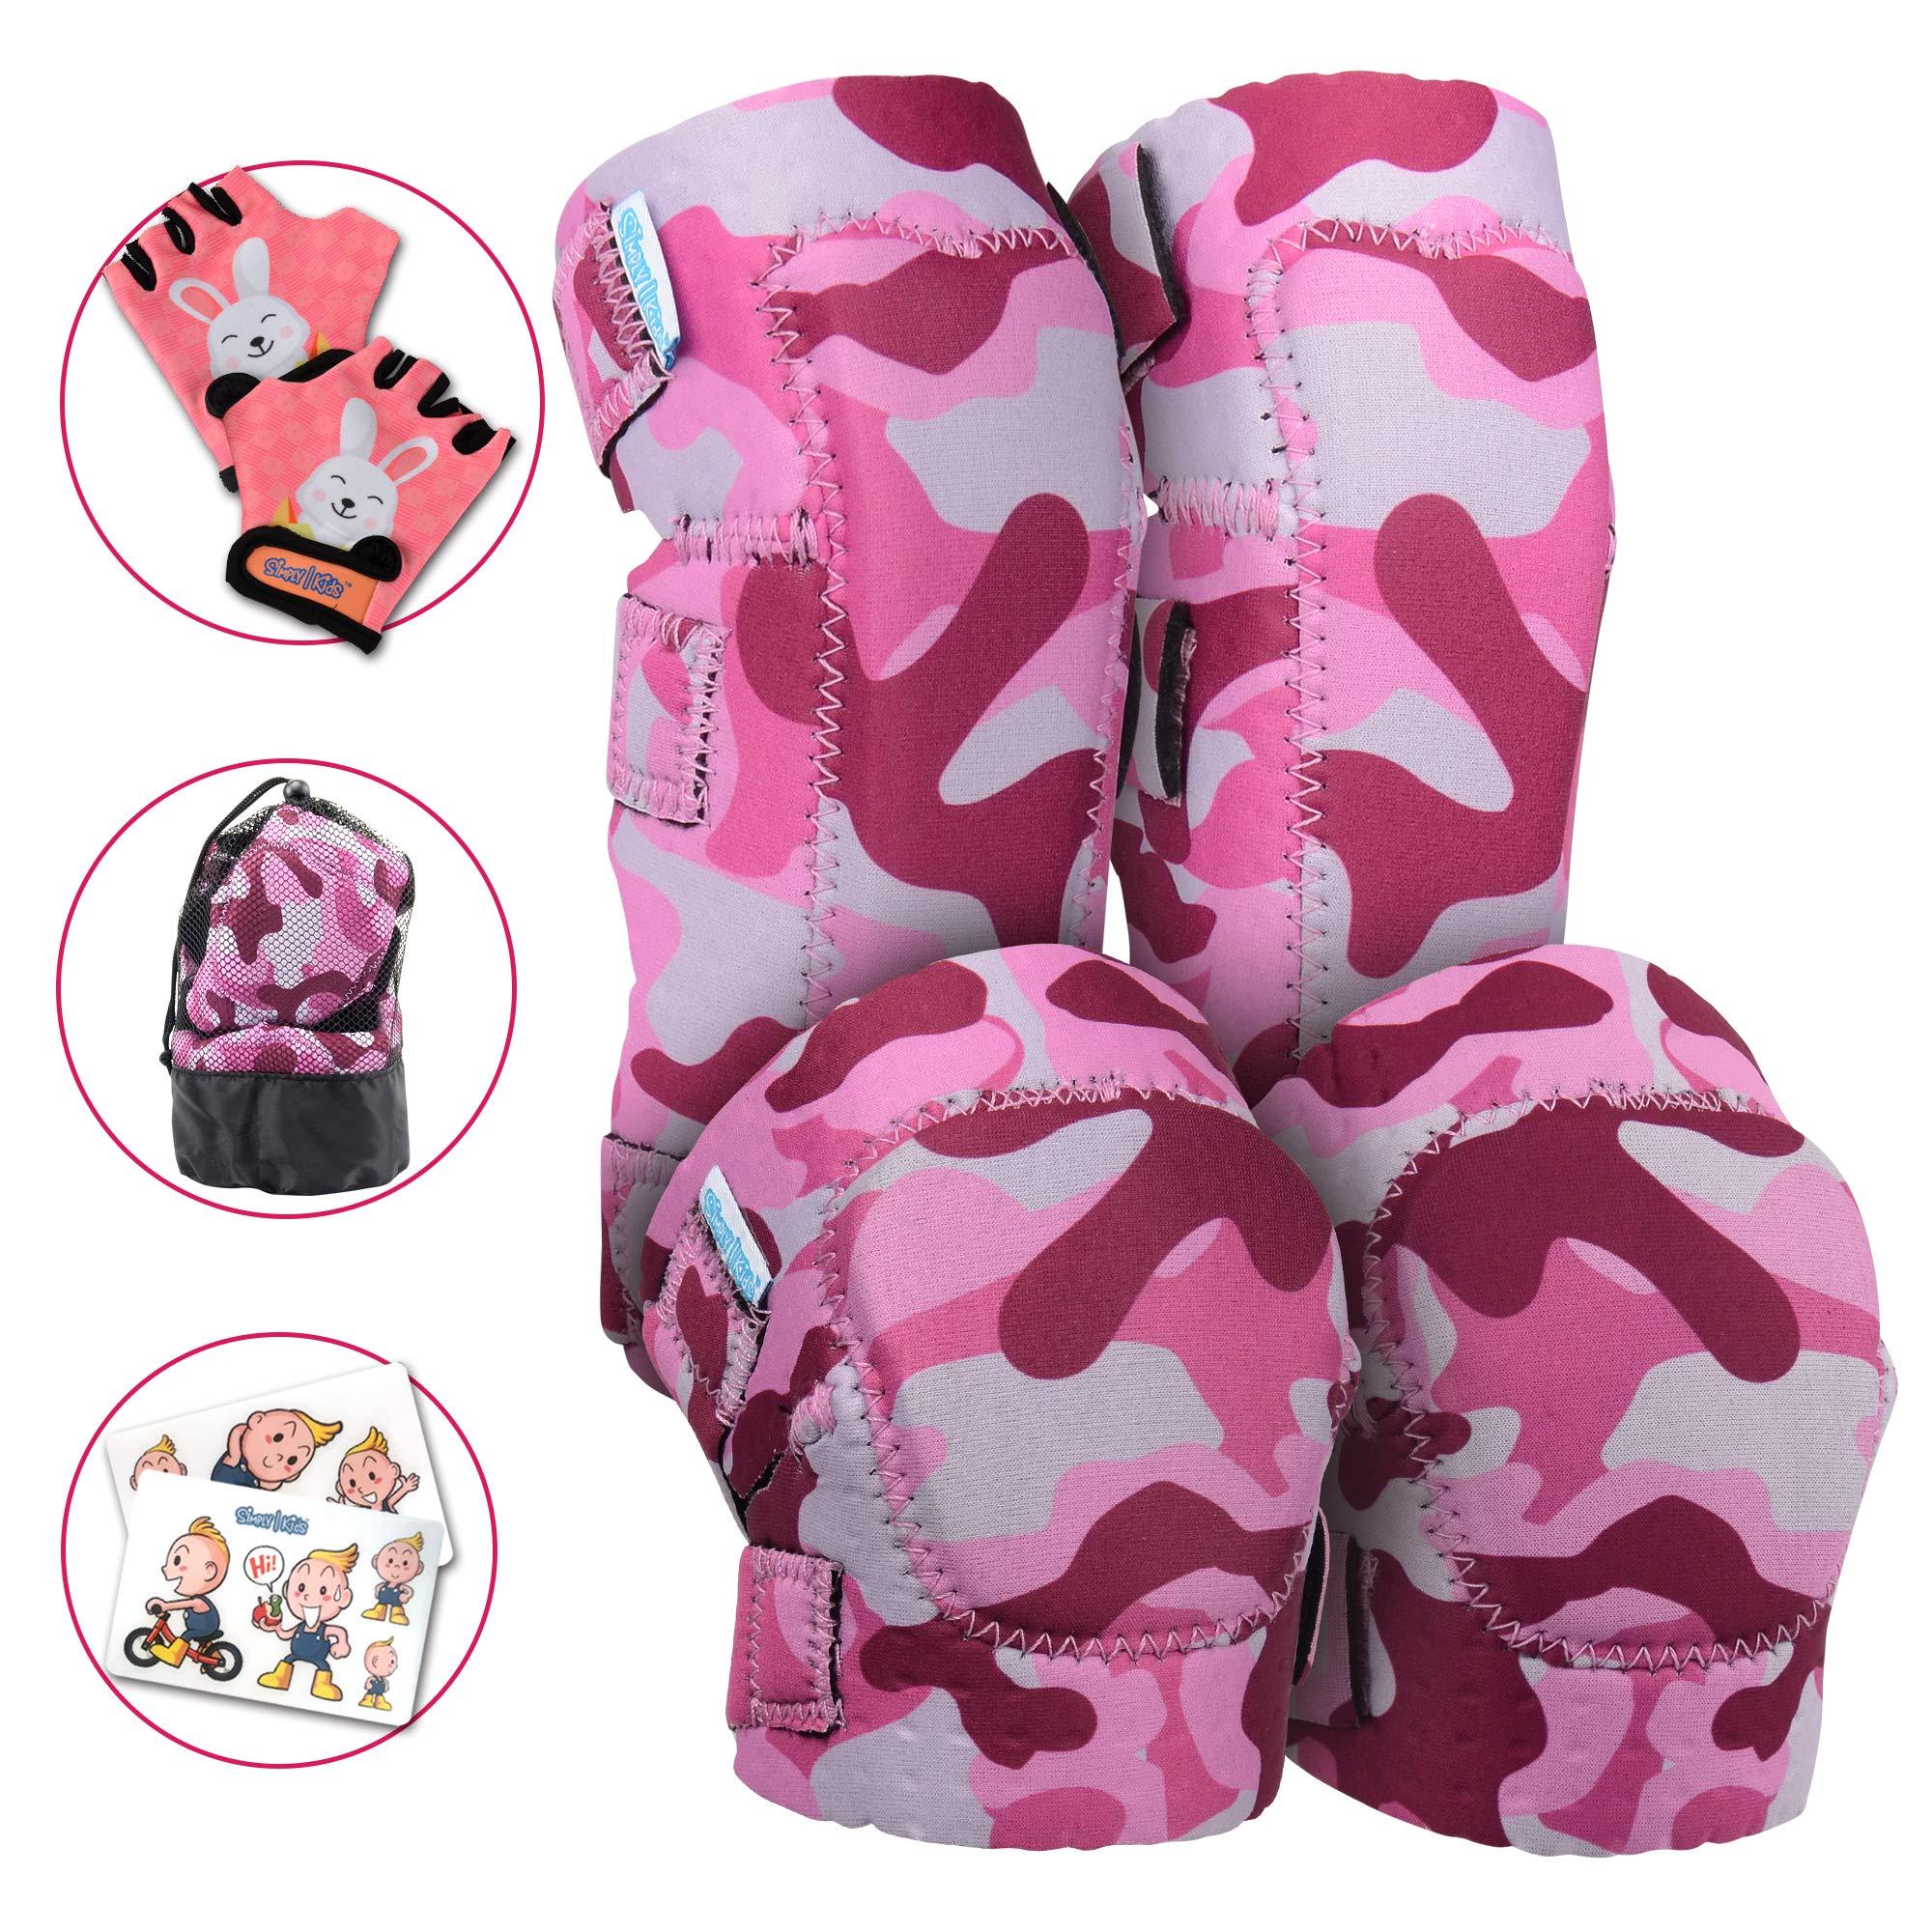 Innovative Soft Kids Knee and Elbow Pads with Bike Gloves | Toddler Protective Gear Set w/Mesh Bag | Roller-Skating, Skateboard for Children Boys Girls